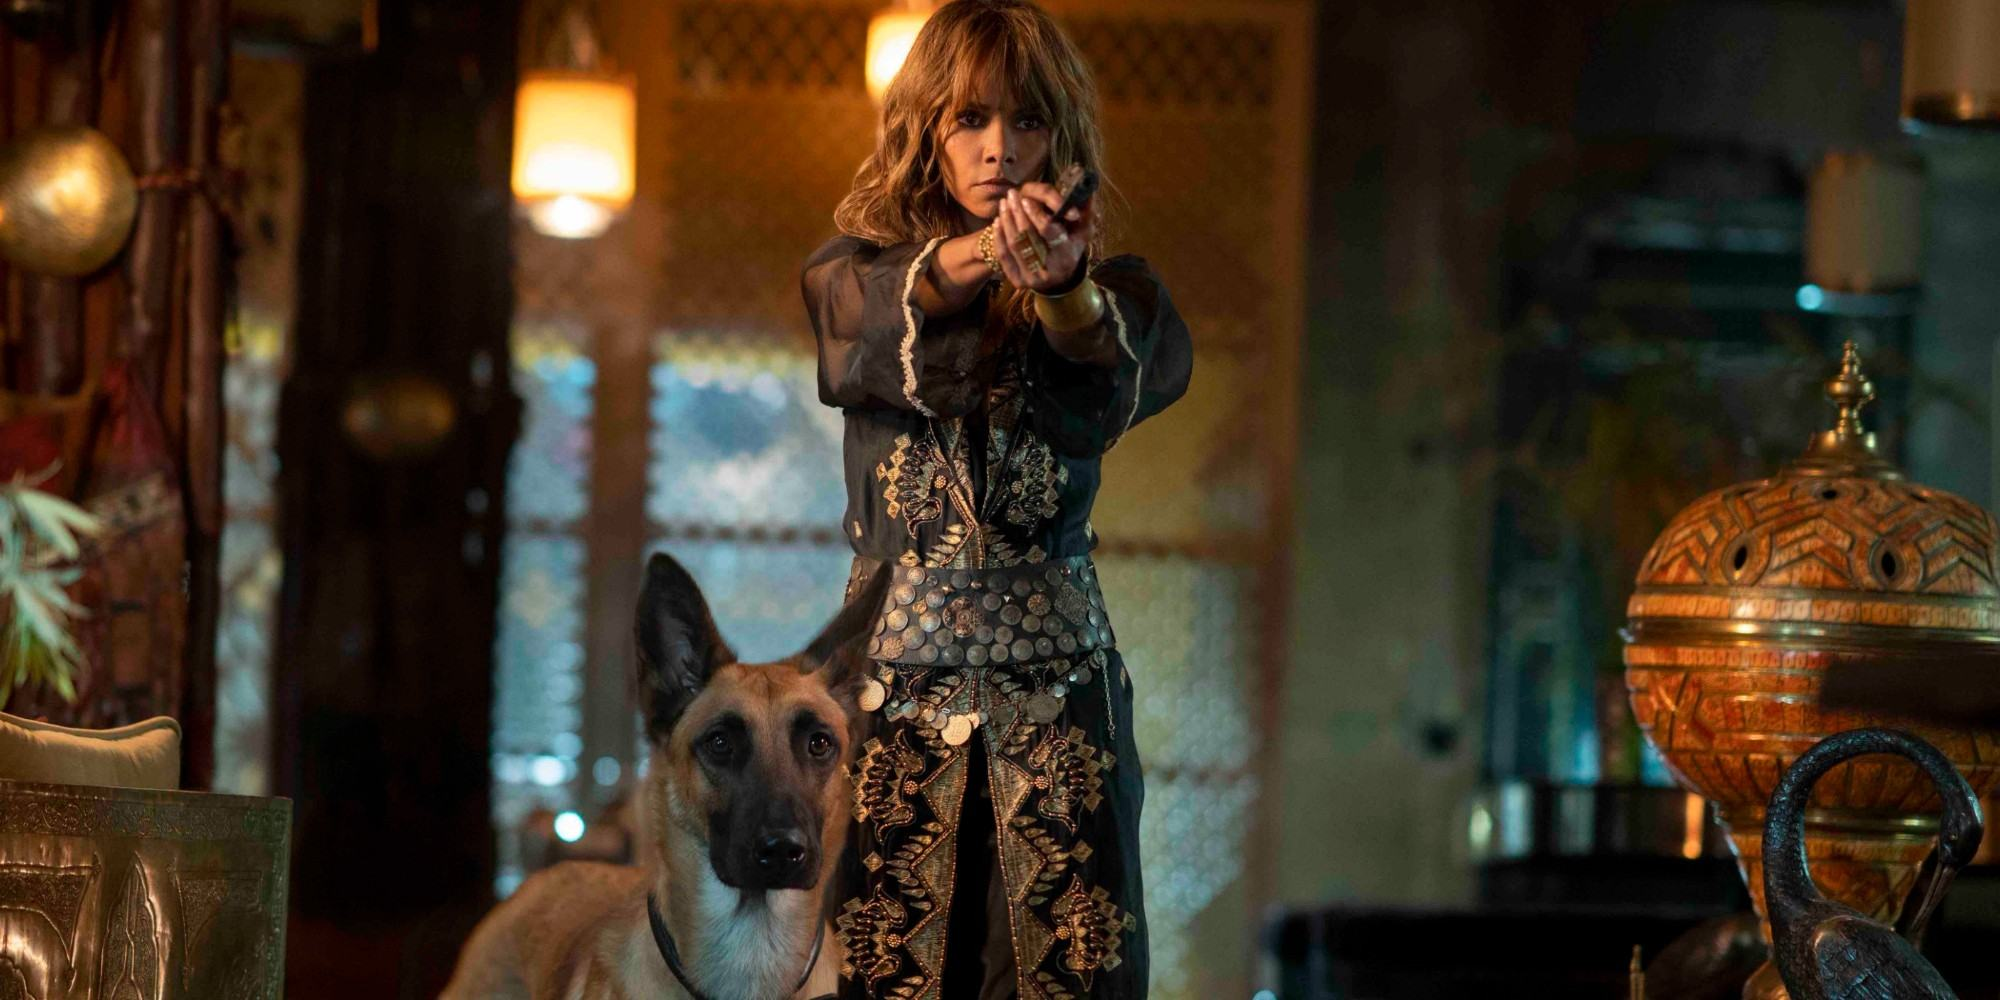 Watch John Wick 3 Parabellum 2019 Full Movie Online Free Watch John Wick 3 Parabellum Online Full 2019 Hd Movie